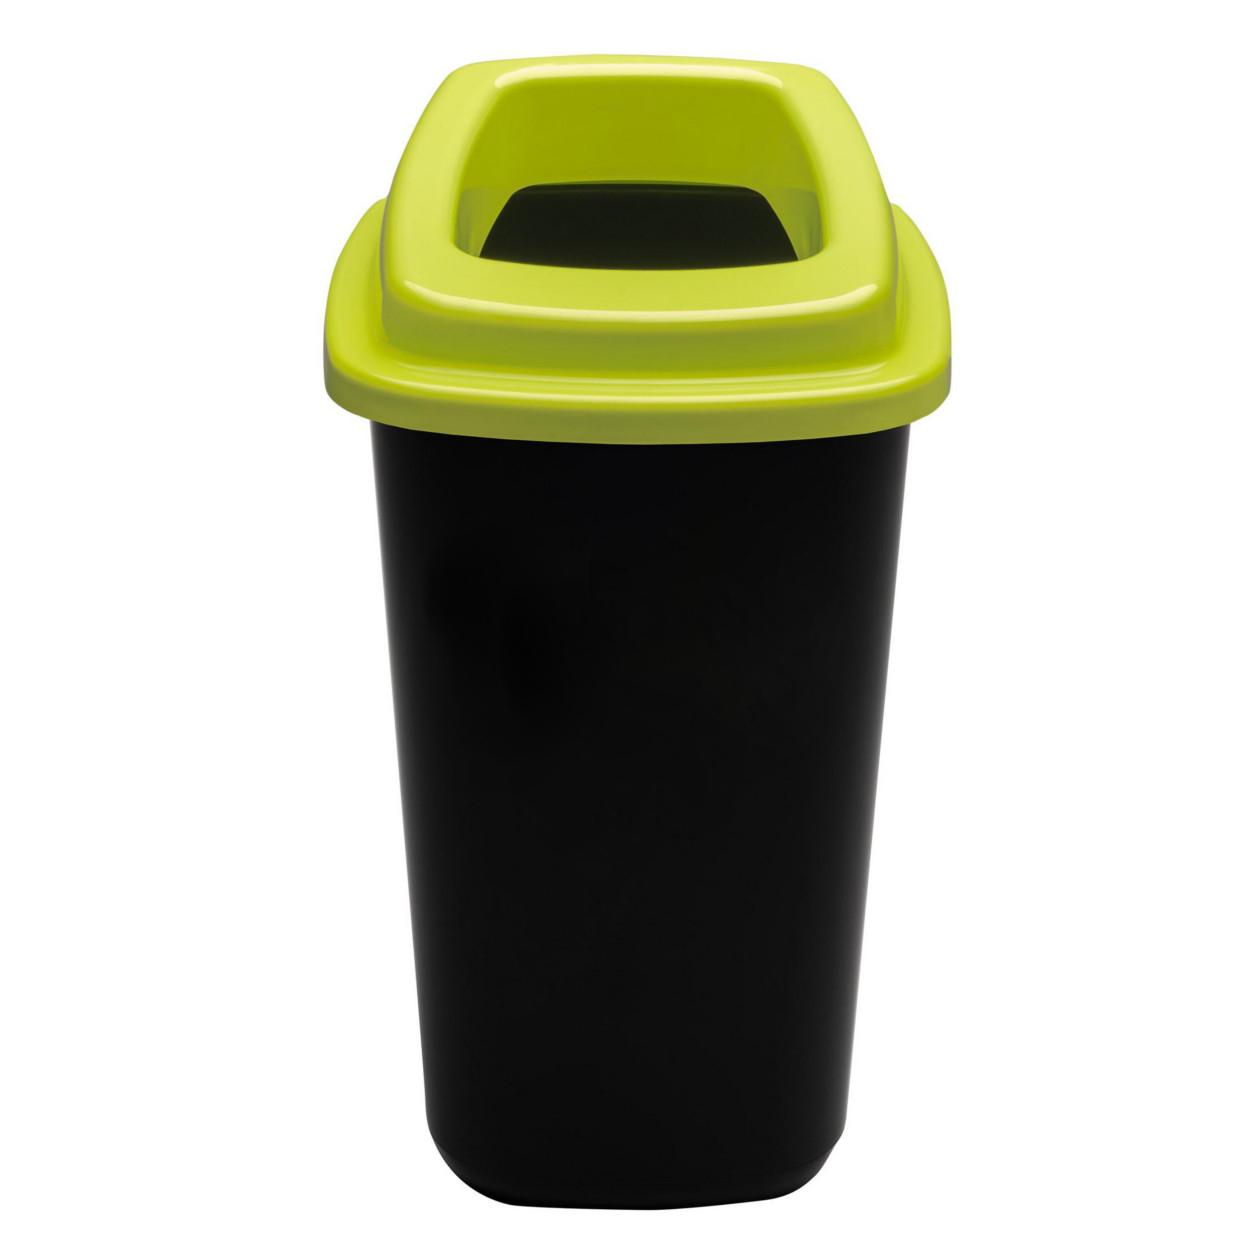 Plastový kôš na triedený odpad, 45 l, zelená